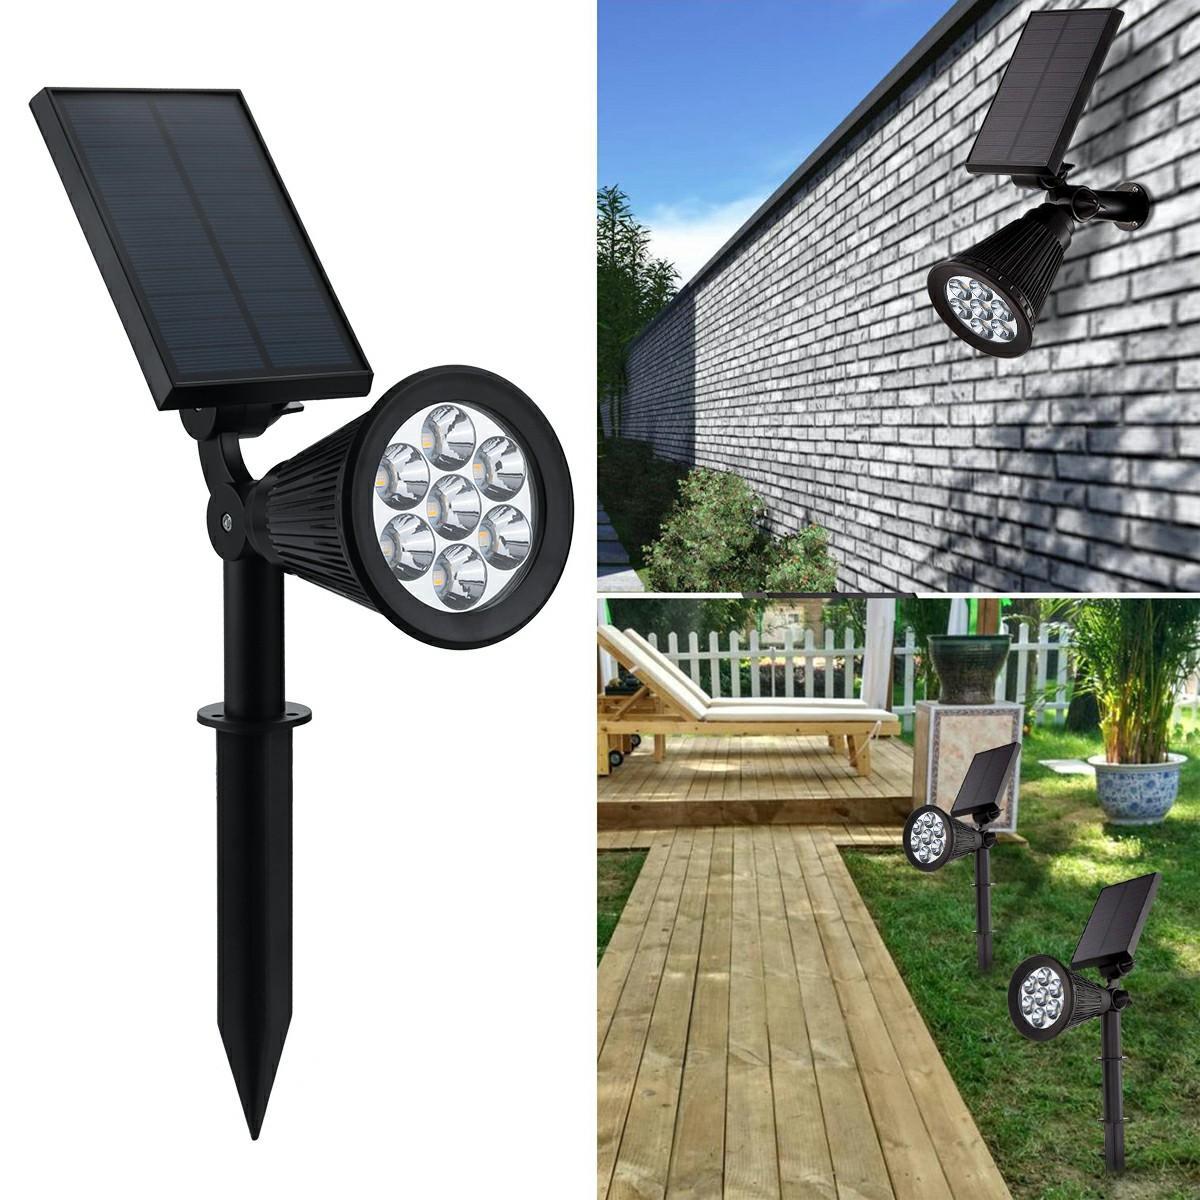 7 LED Discoloration Solar Lights Insert Floor Lawn Garden Lights